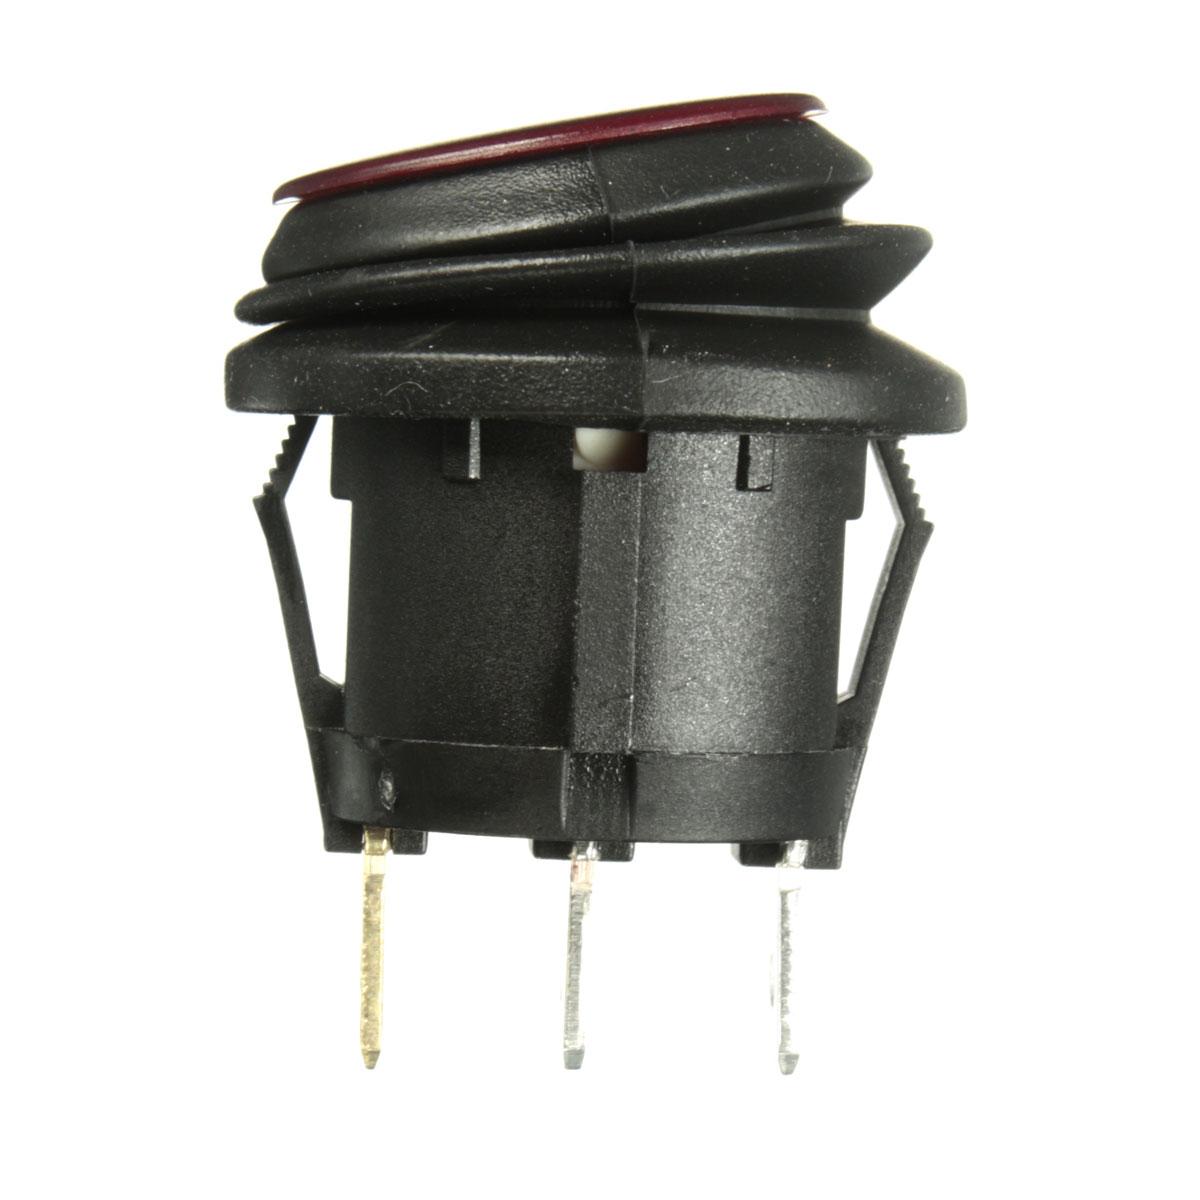 Led Rocker Switch Wiring Diagram 5 Pin Also Universal Fog Light Rocker